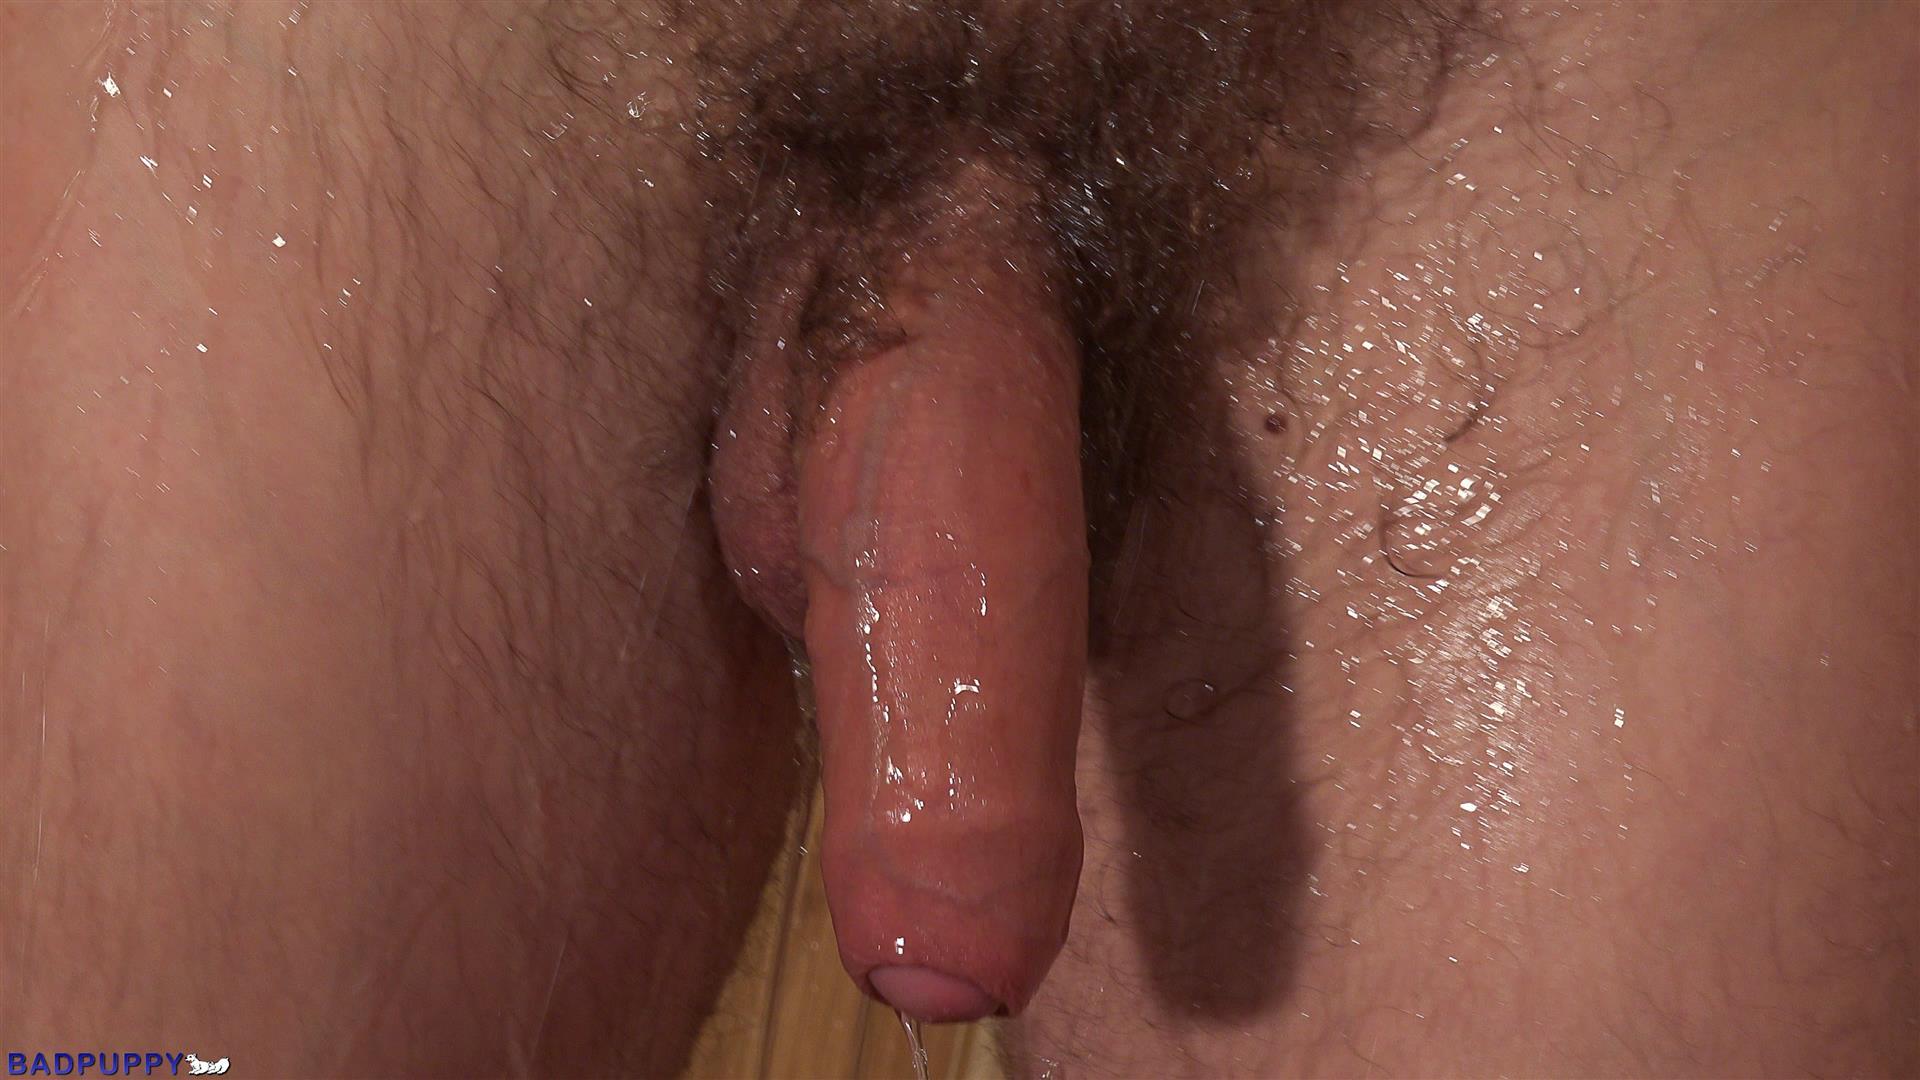 Oleg-Moloda-Badpuppy-Straight-Czech-Jock-With-Big-Uncut-Cock-Amateur-Gay-Porn-21 Straight Czech Muscle Jock Auditions For Gay Porn